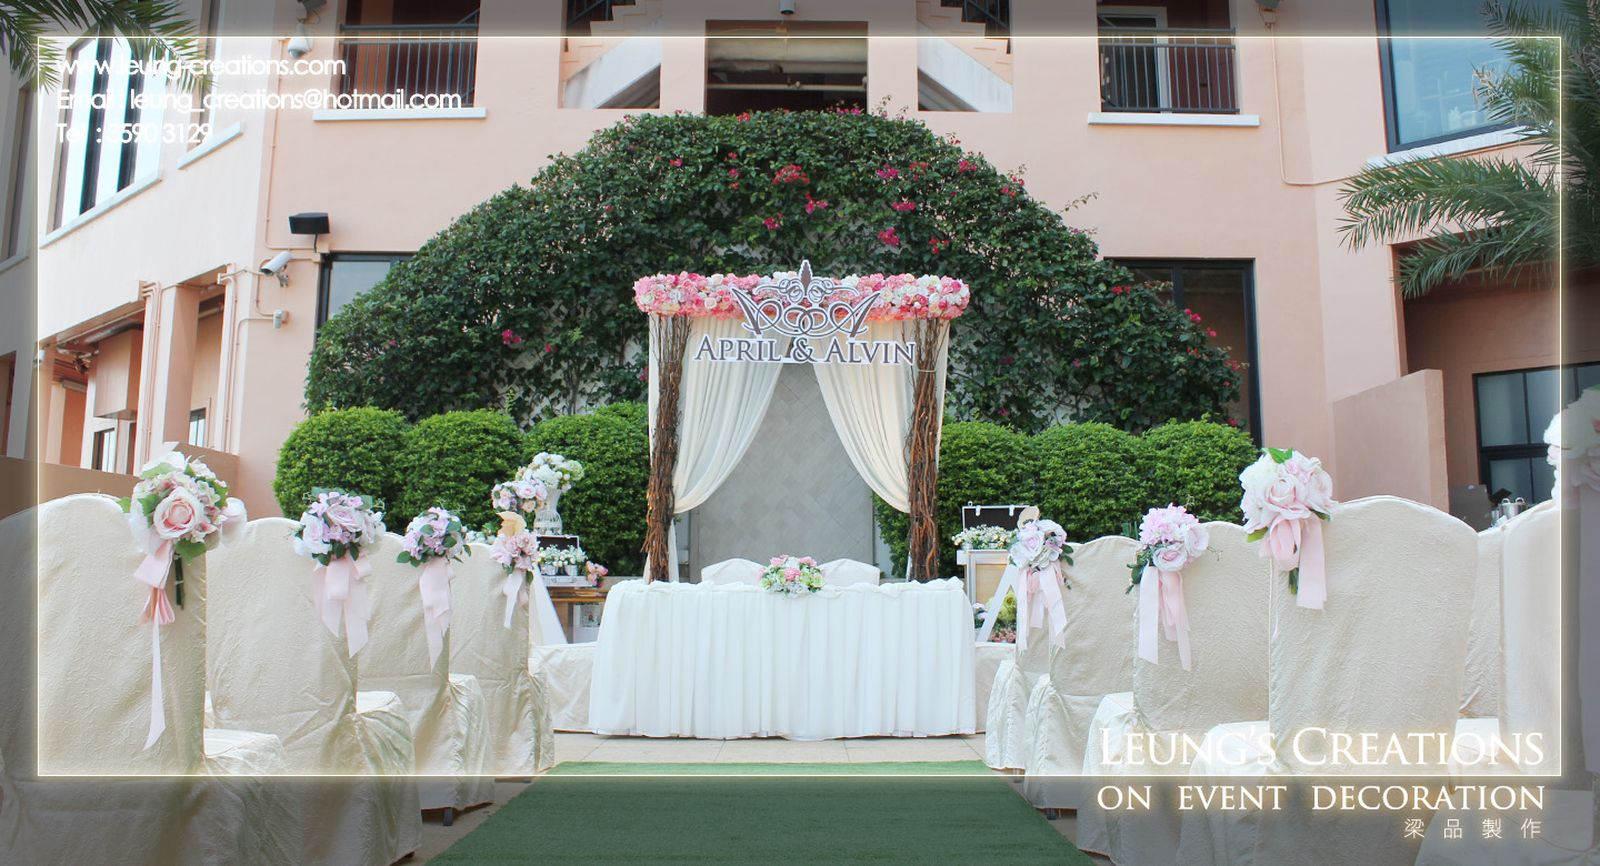 婚宴場地相片   香港婚宴資料庫相   婚禮場地相 / Wedding Venue Database photo, Search Hong Kong wedding Venue photo